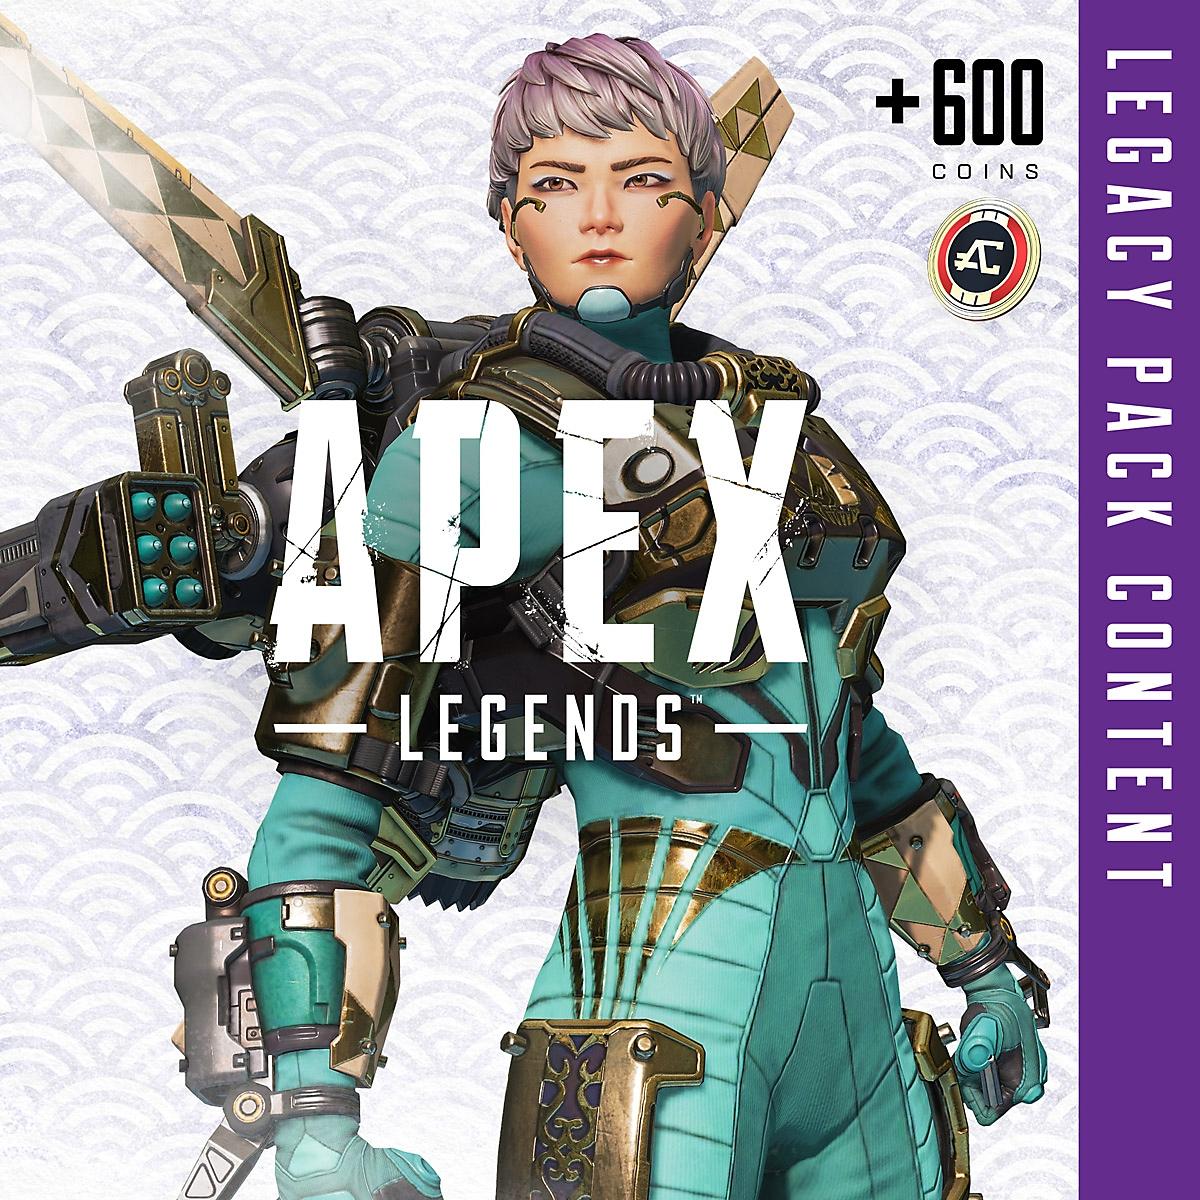 Apex Legends - Legacy Pack Content